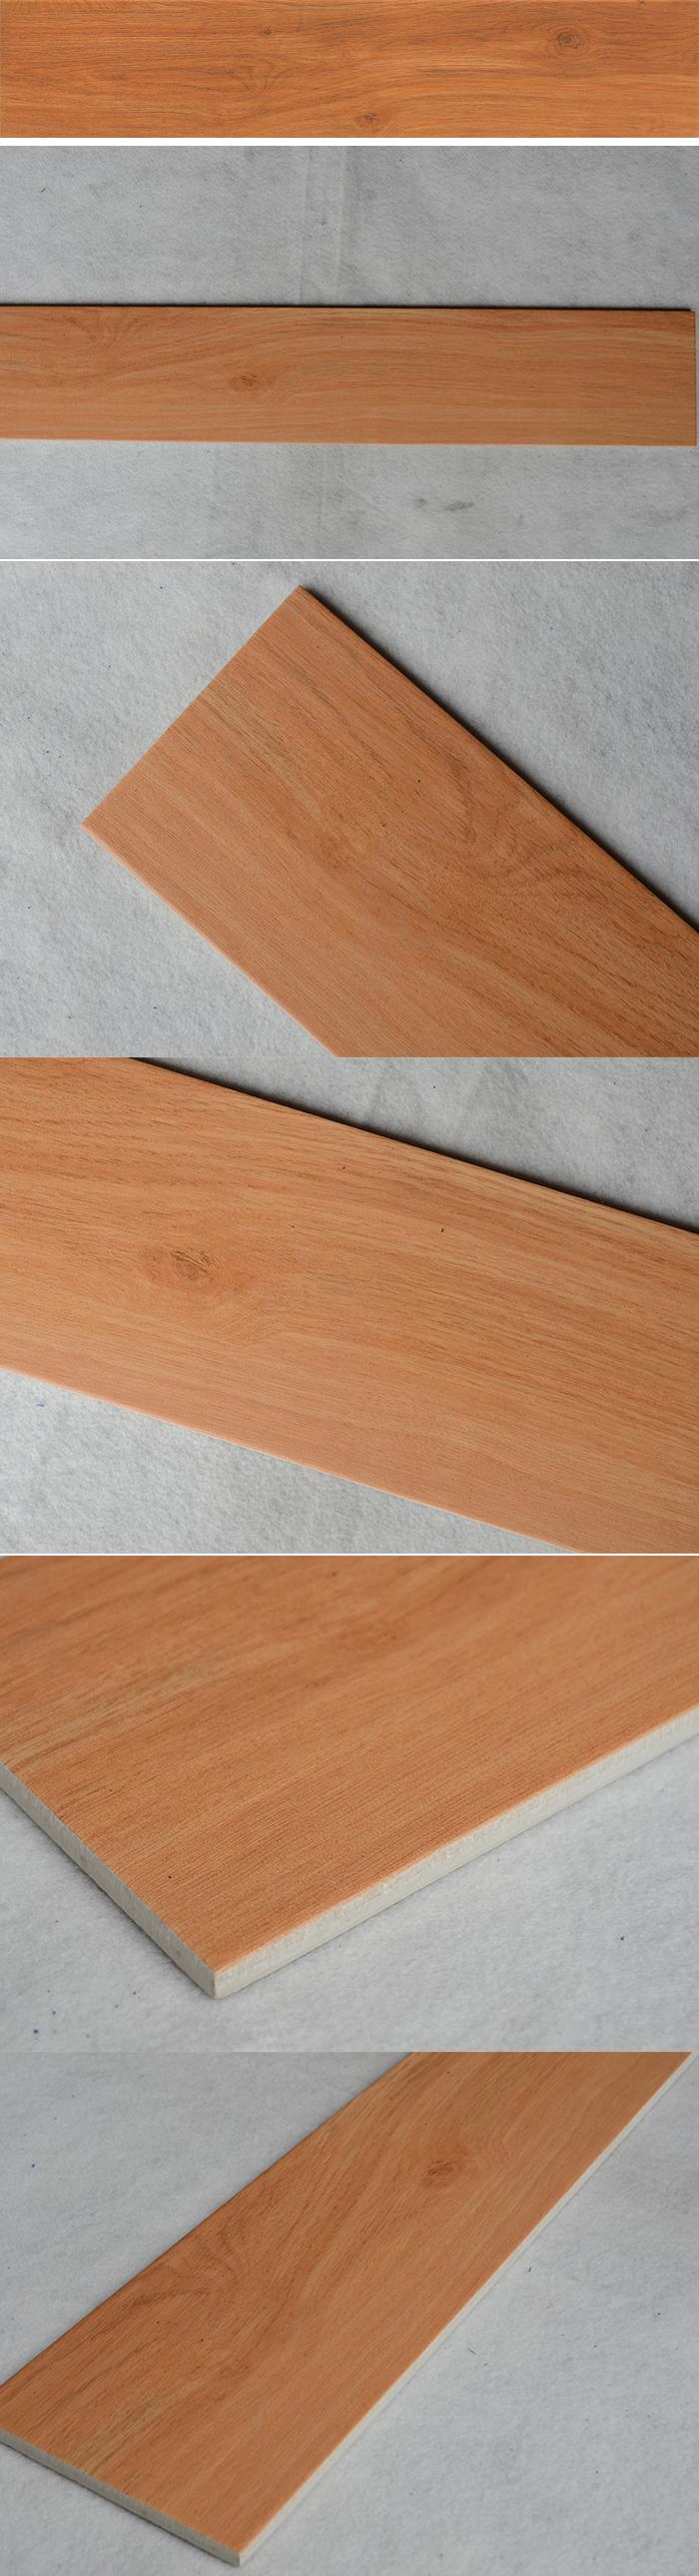 Hj15804m foshan wooden brick porcelain wood texture tile flooring hj15804m foshan wooden brick porcelain wood texture tile flooring dailygadgetfo Image collections